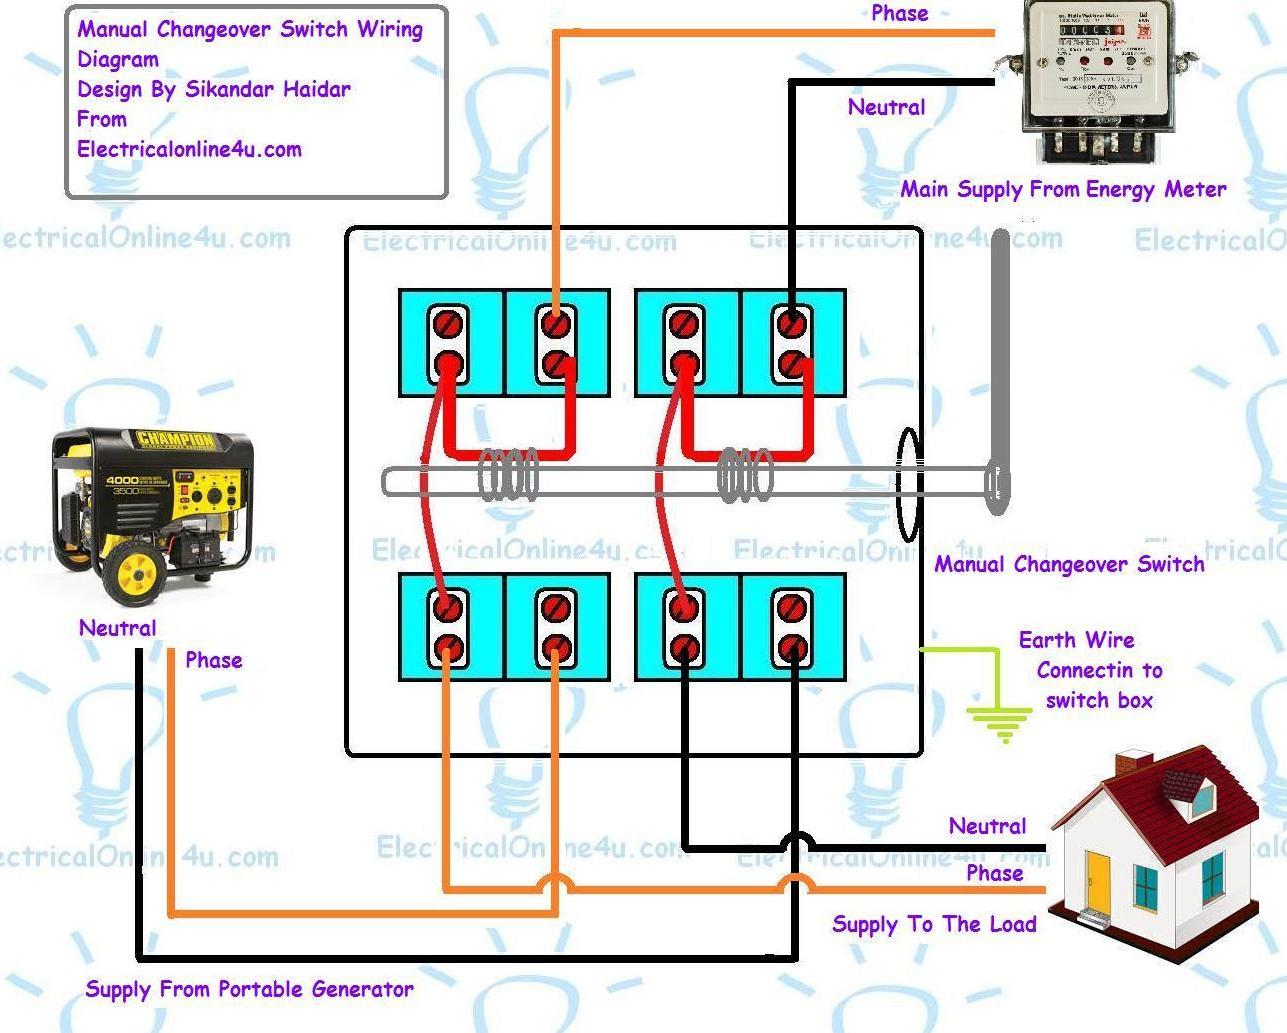 [DIAGRAM_38DE]  DR_5874] Champion 4000 Watt Wiring Diagram Get Free Image About Wiring | Champion Switch Wiring Diagram |  | Gue45 Inkl Grebs Gue45 Weasi Semec Hete Reda Inrebe Trons Mohammedshrine  Librar Wiring 101